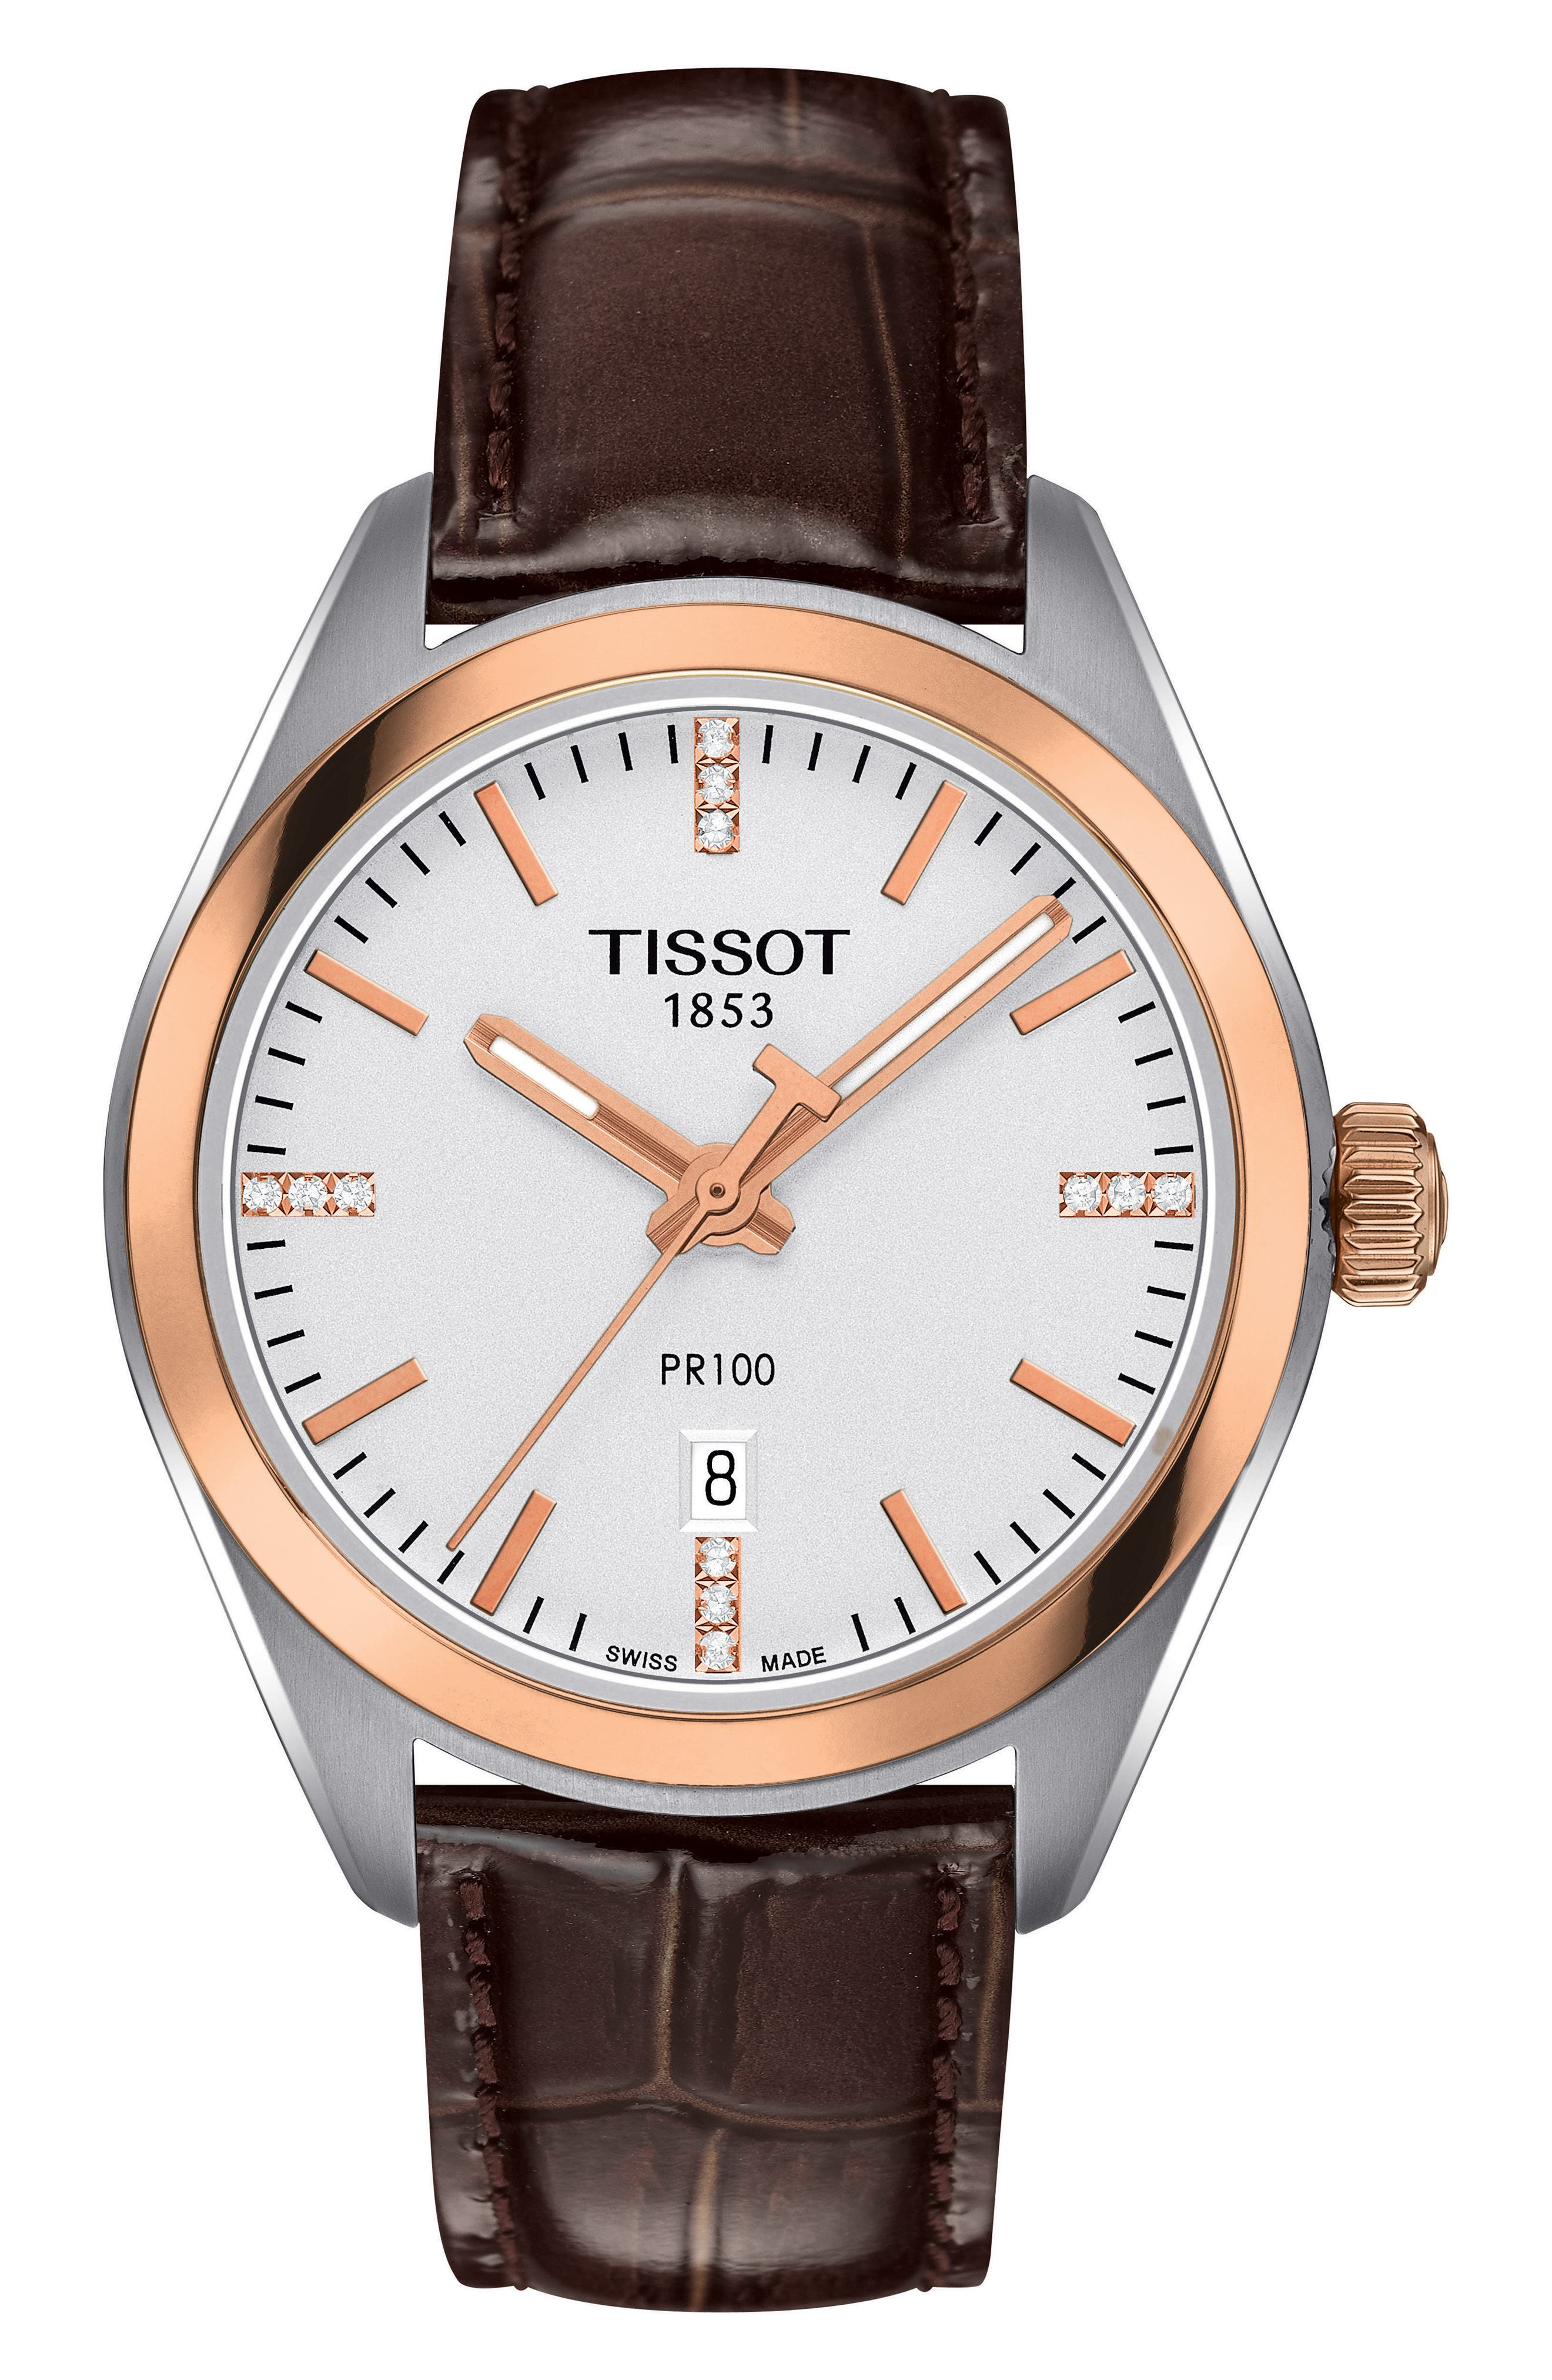 Main Image - Tissot PR100 Diamond Leather Strap Watch, 33mm